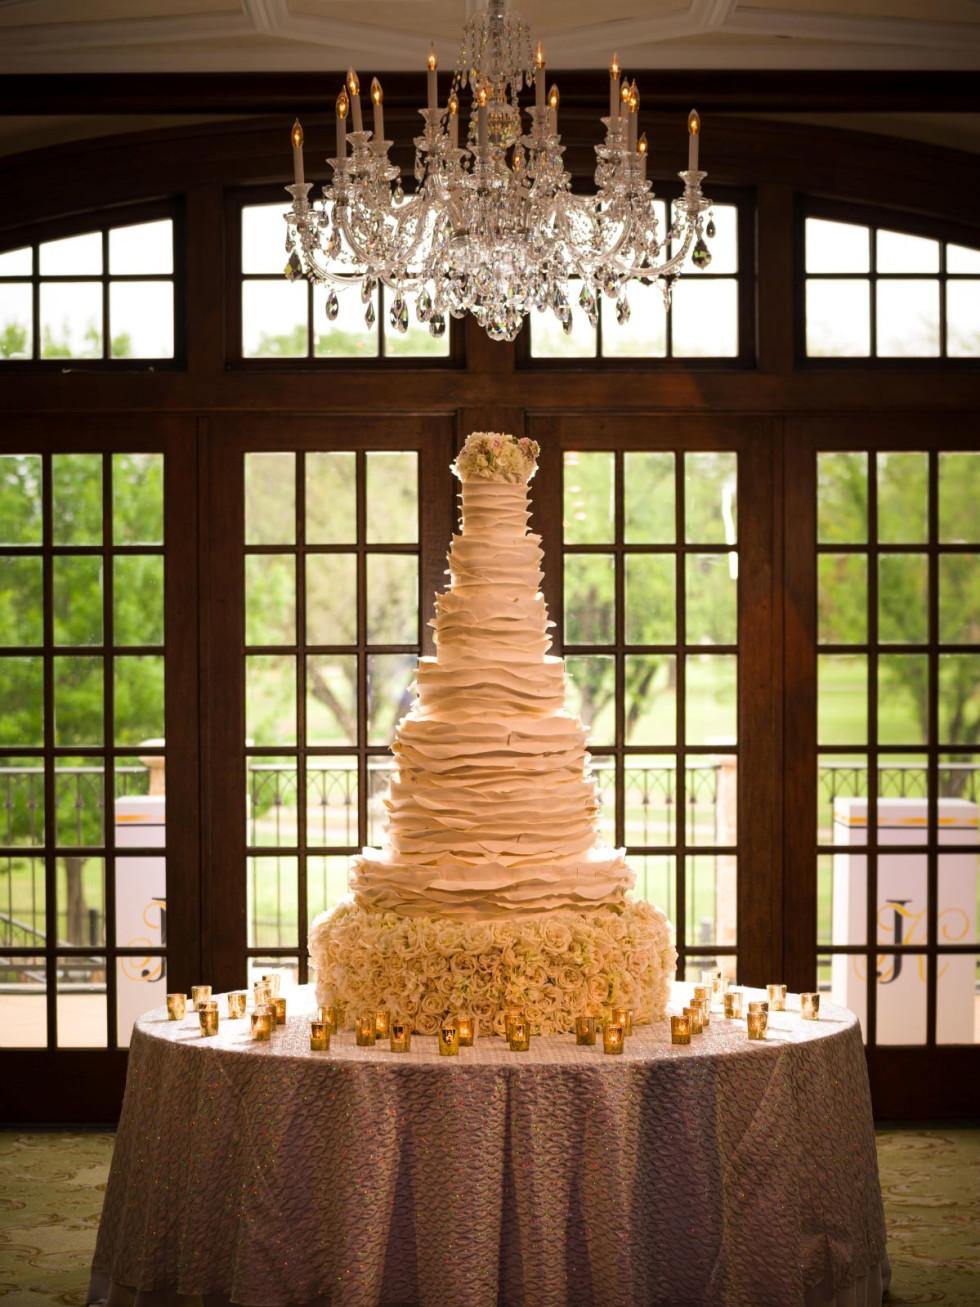 Hallam wedding cake